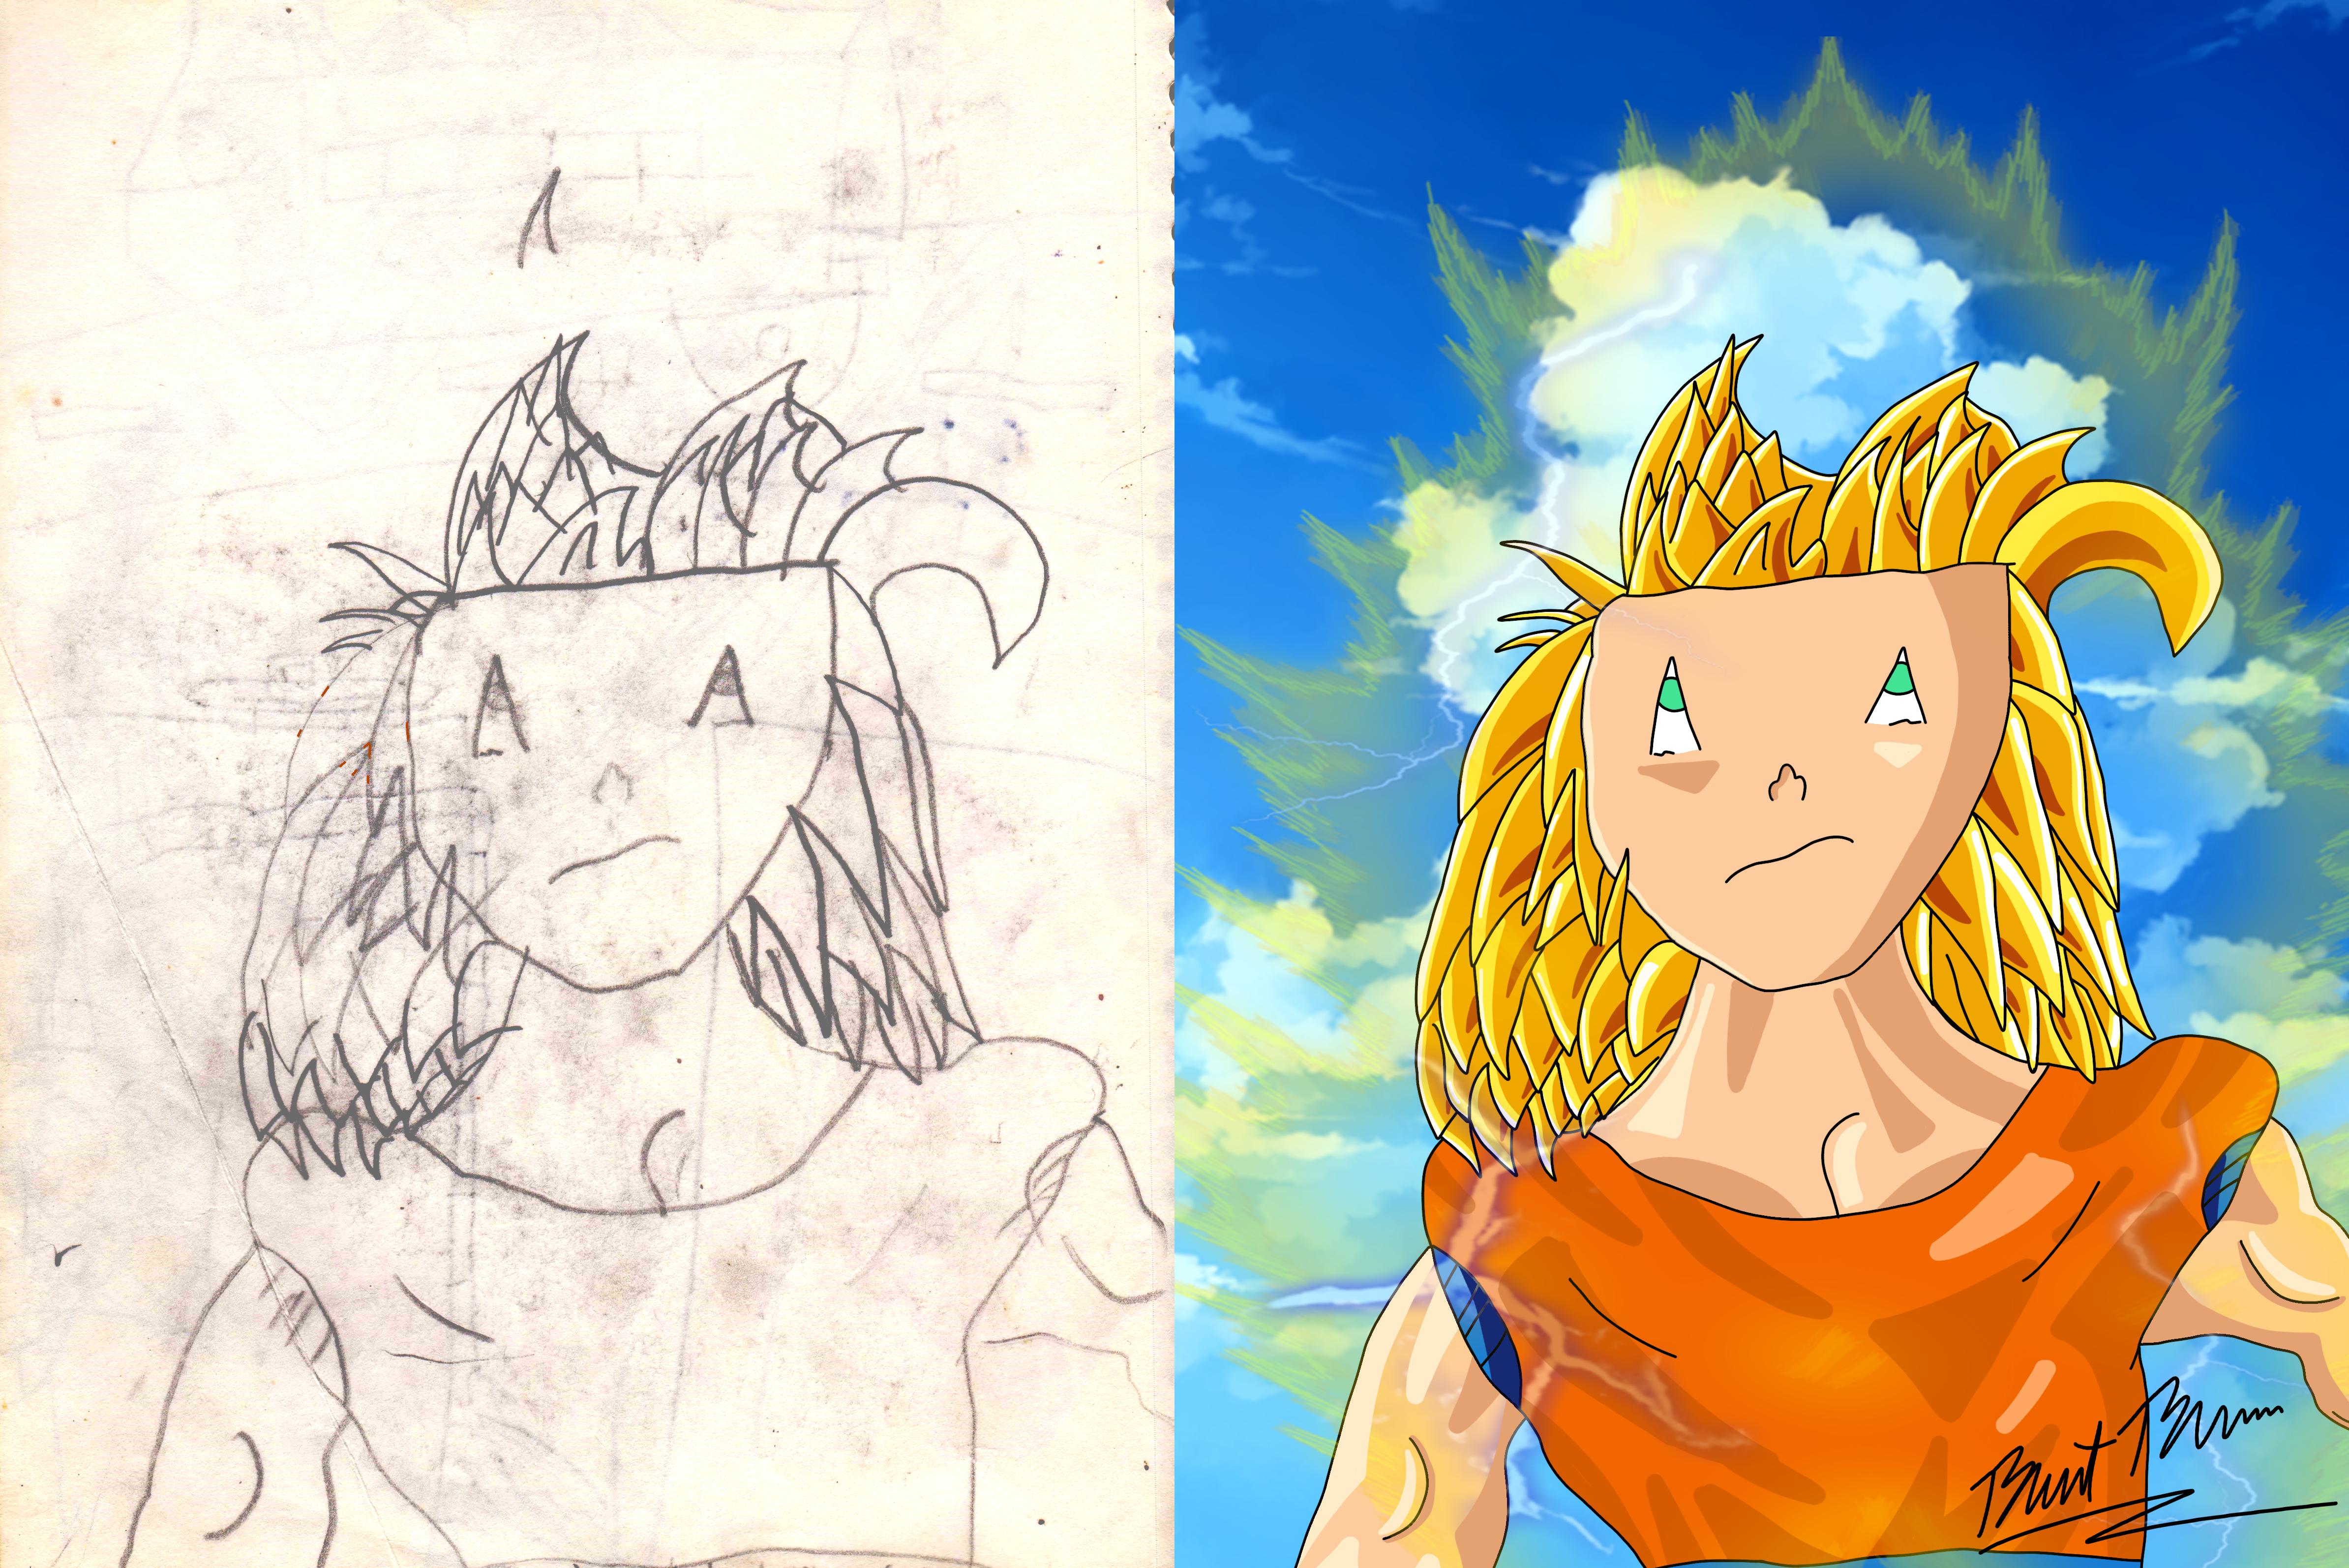 Redrawing Childhood Art #1 | 2002-2021